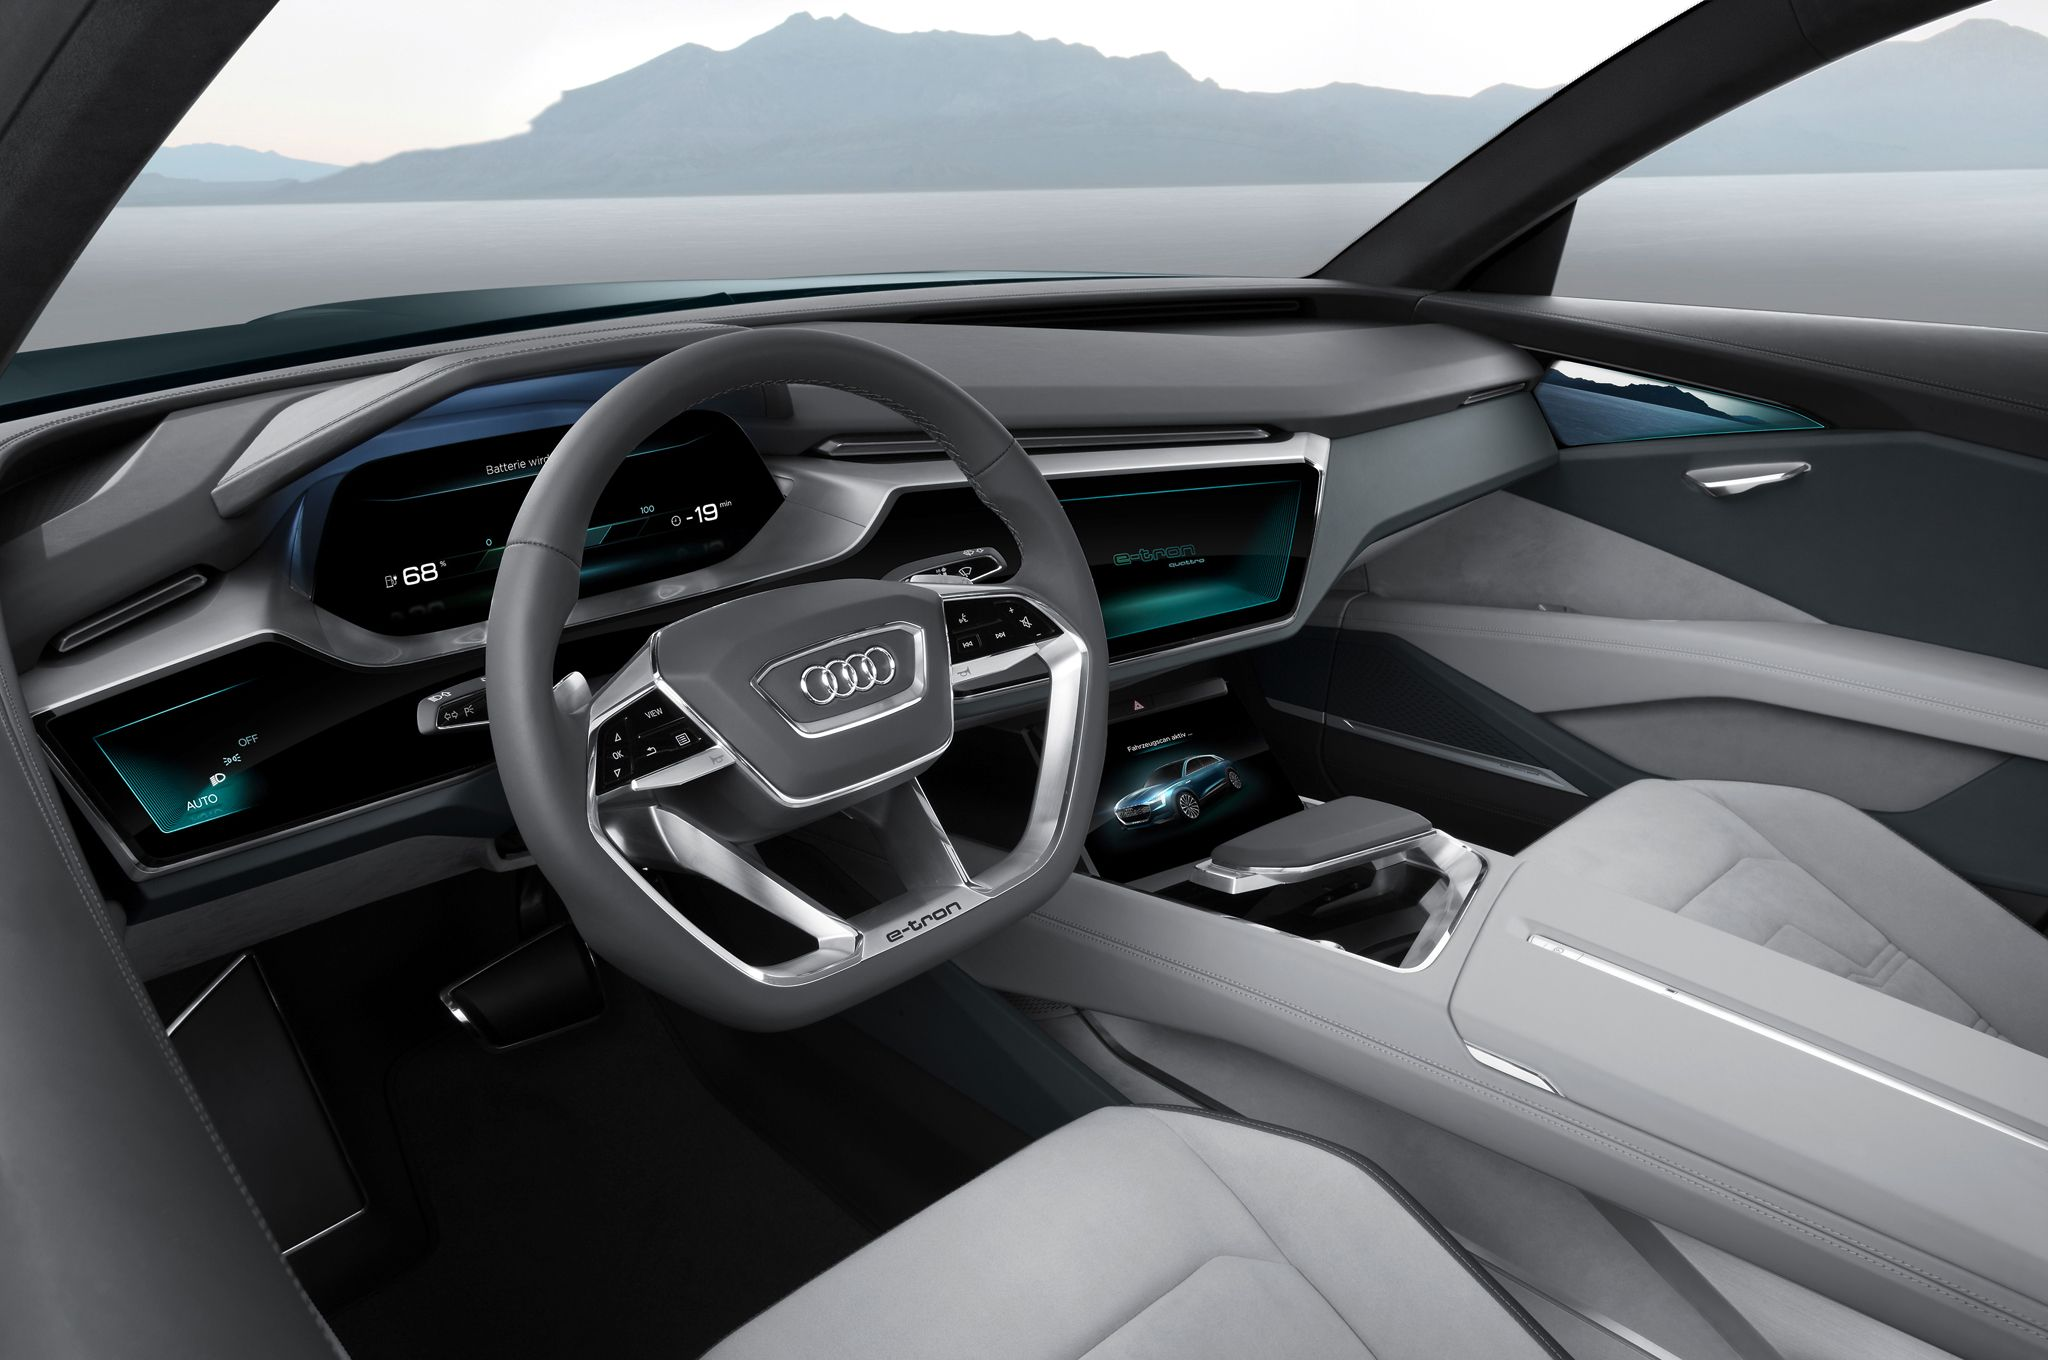 Audi E Tron Quattro Concept Interior Jpg 2048 1360 Audi E Tron Audi Interior E Tron